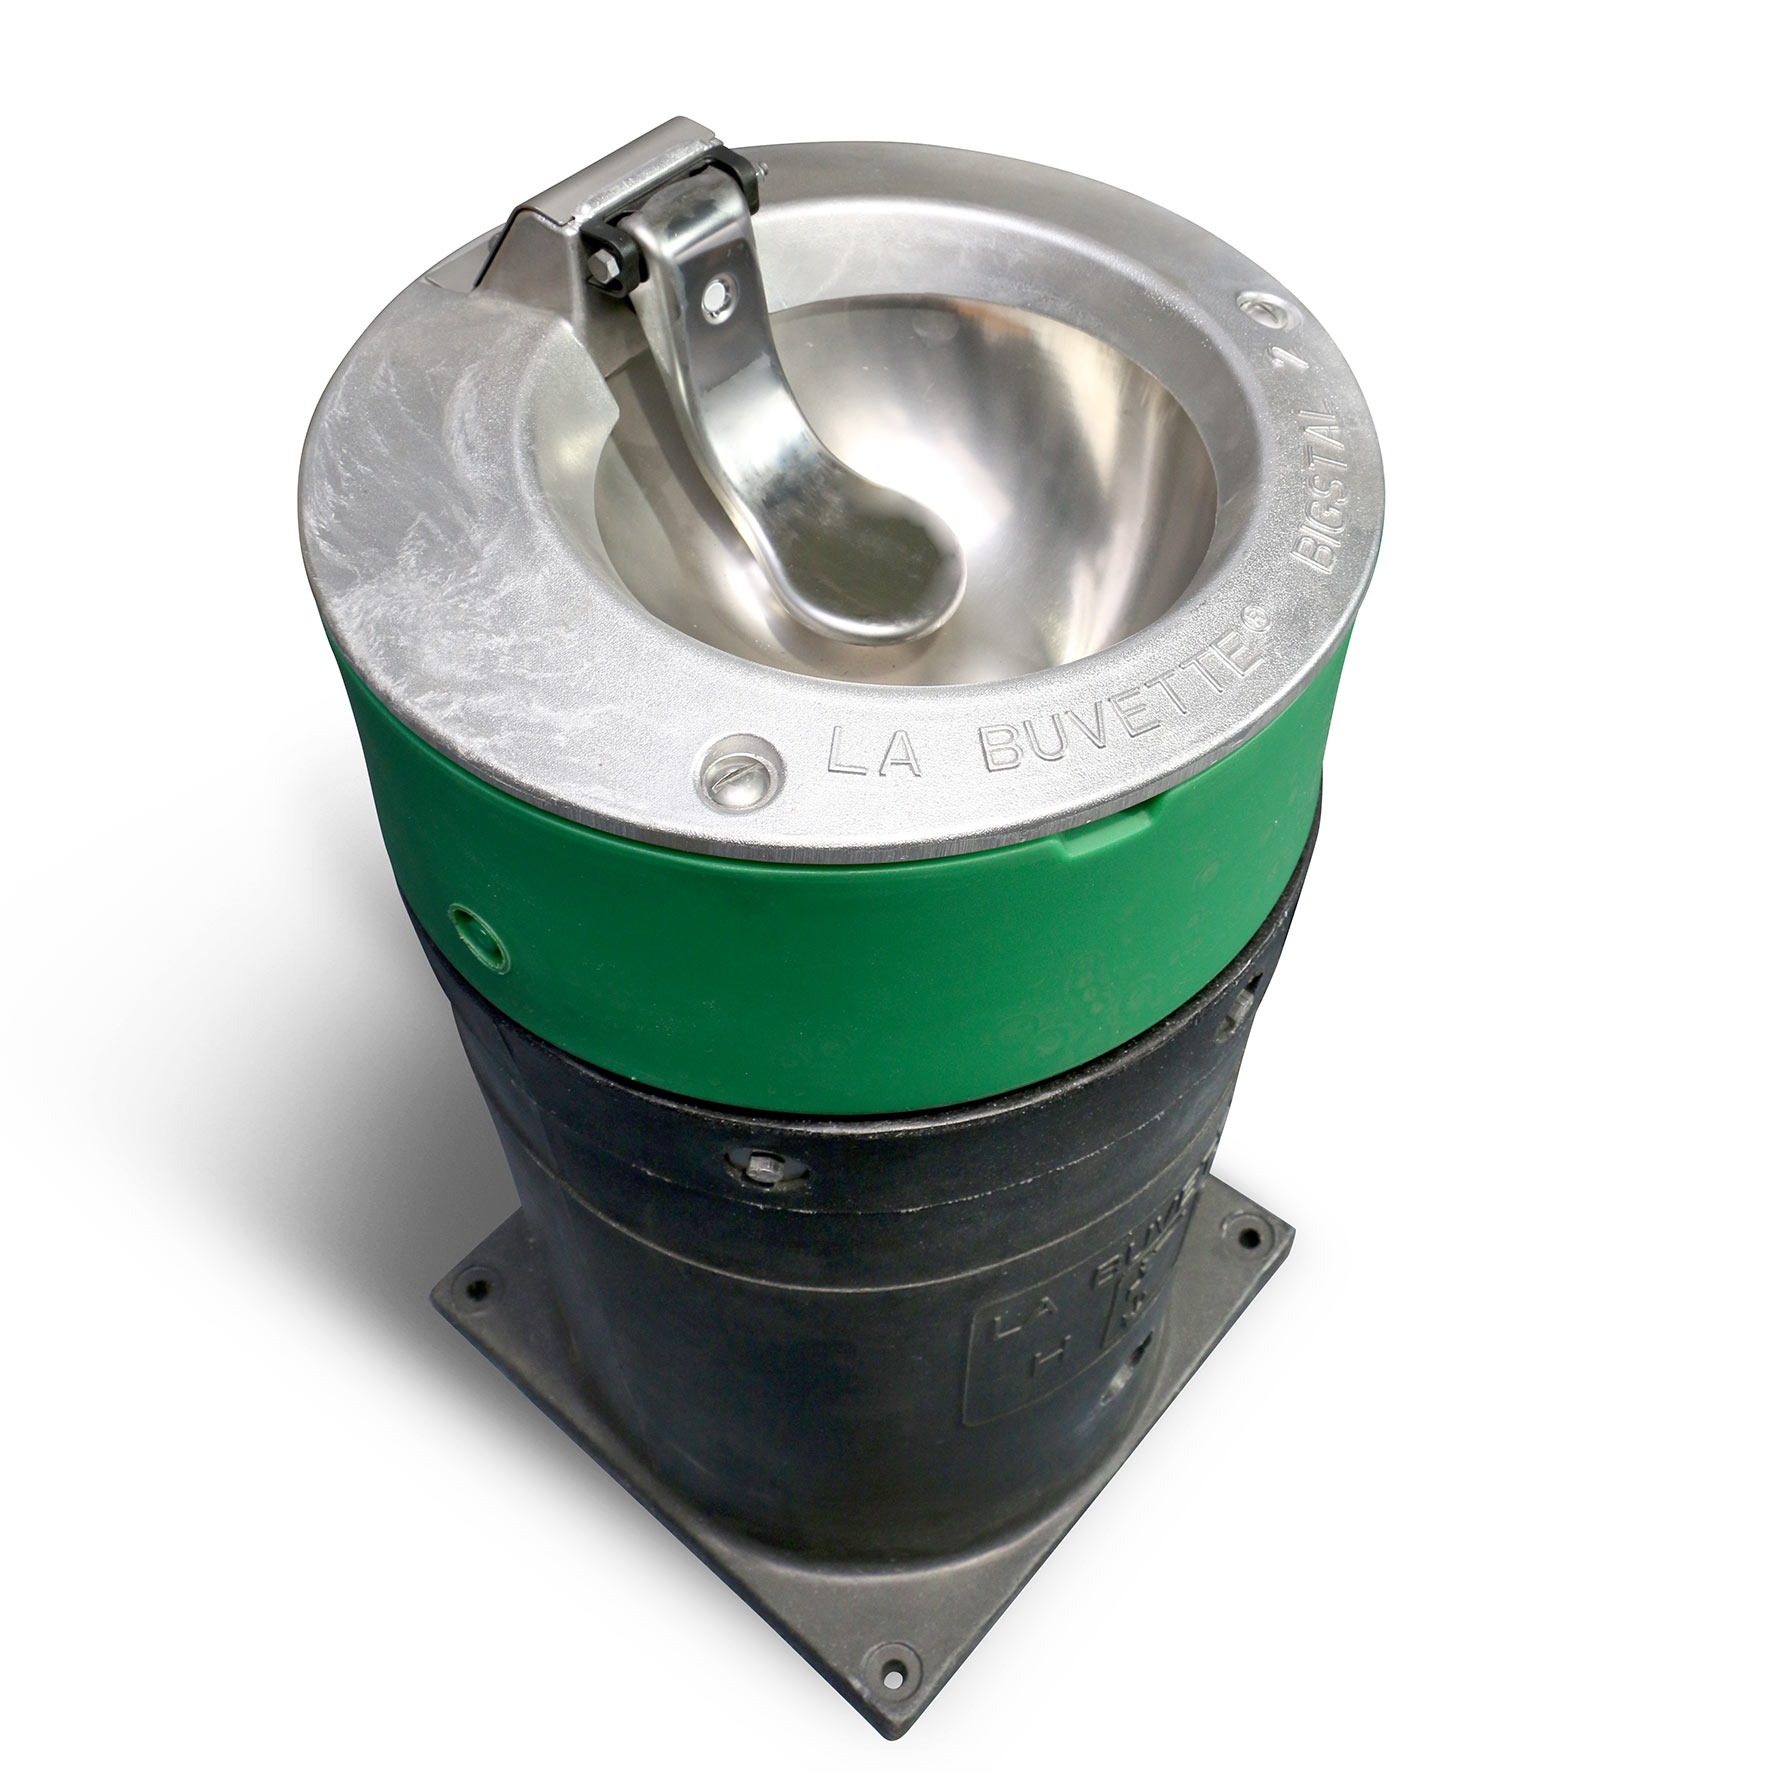 Abreuvoir antigel anti-gaspillage à palette BIGSTAL 2 - 50 W